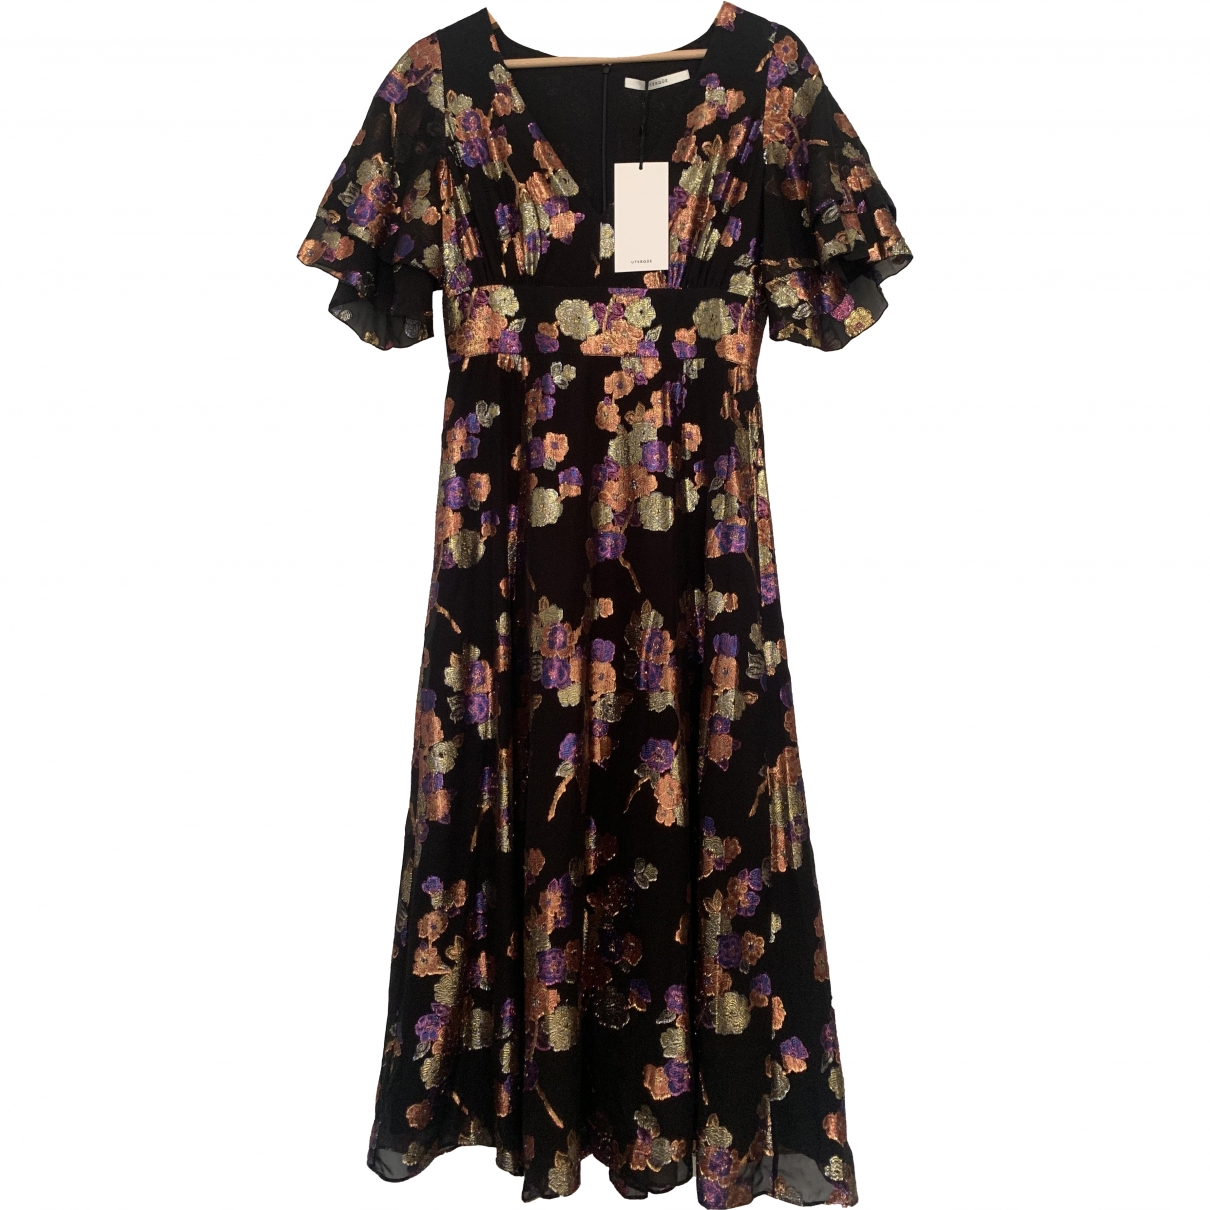 Uterque \N Multicolour dress for Women S International